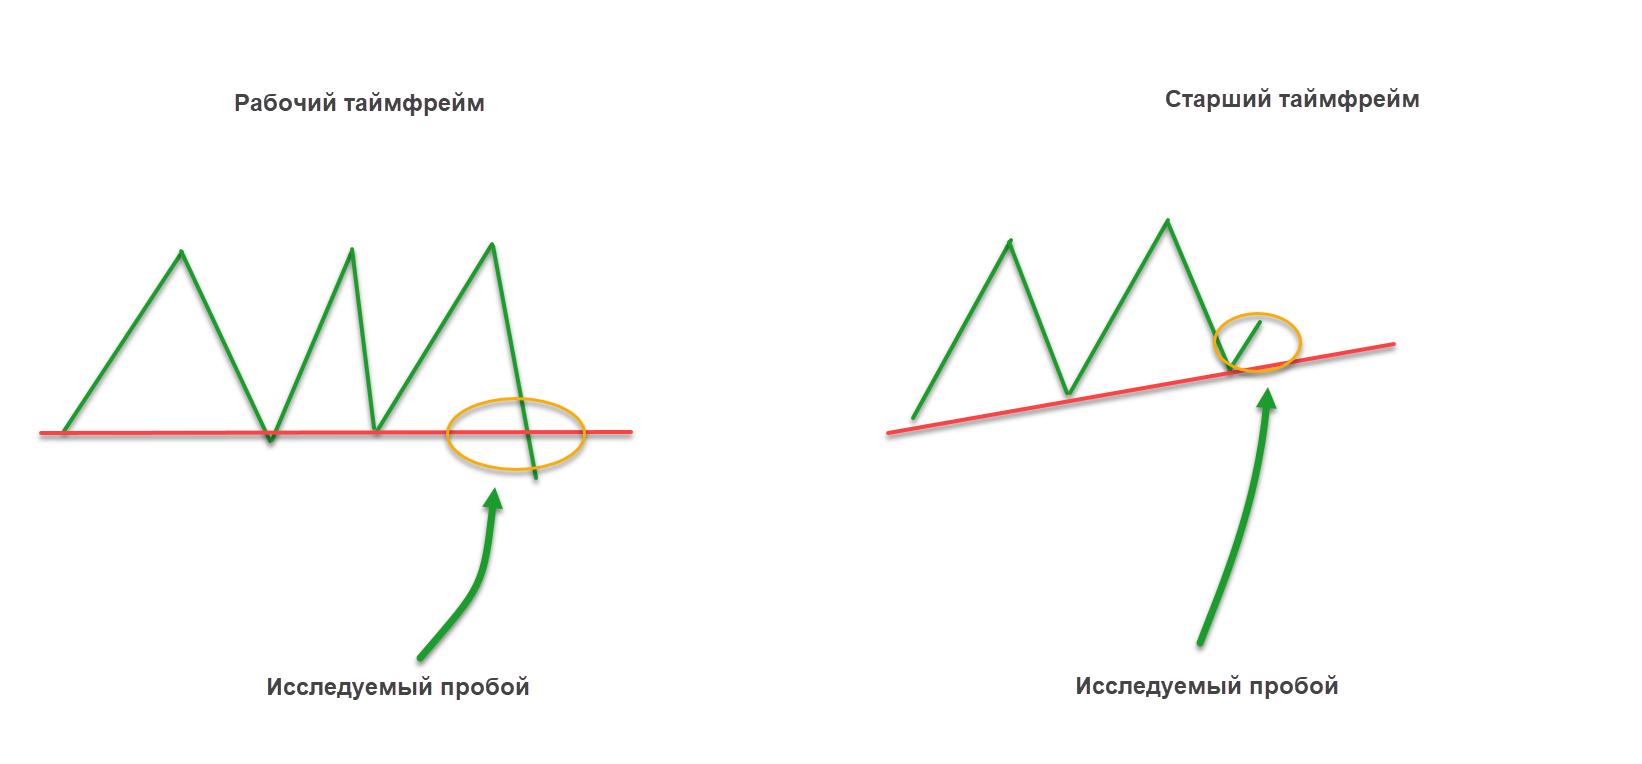 Схема пробоя уровня на форекс